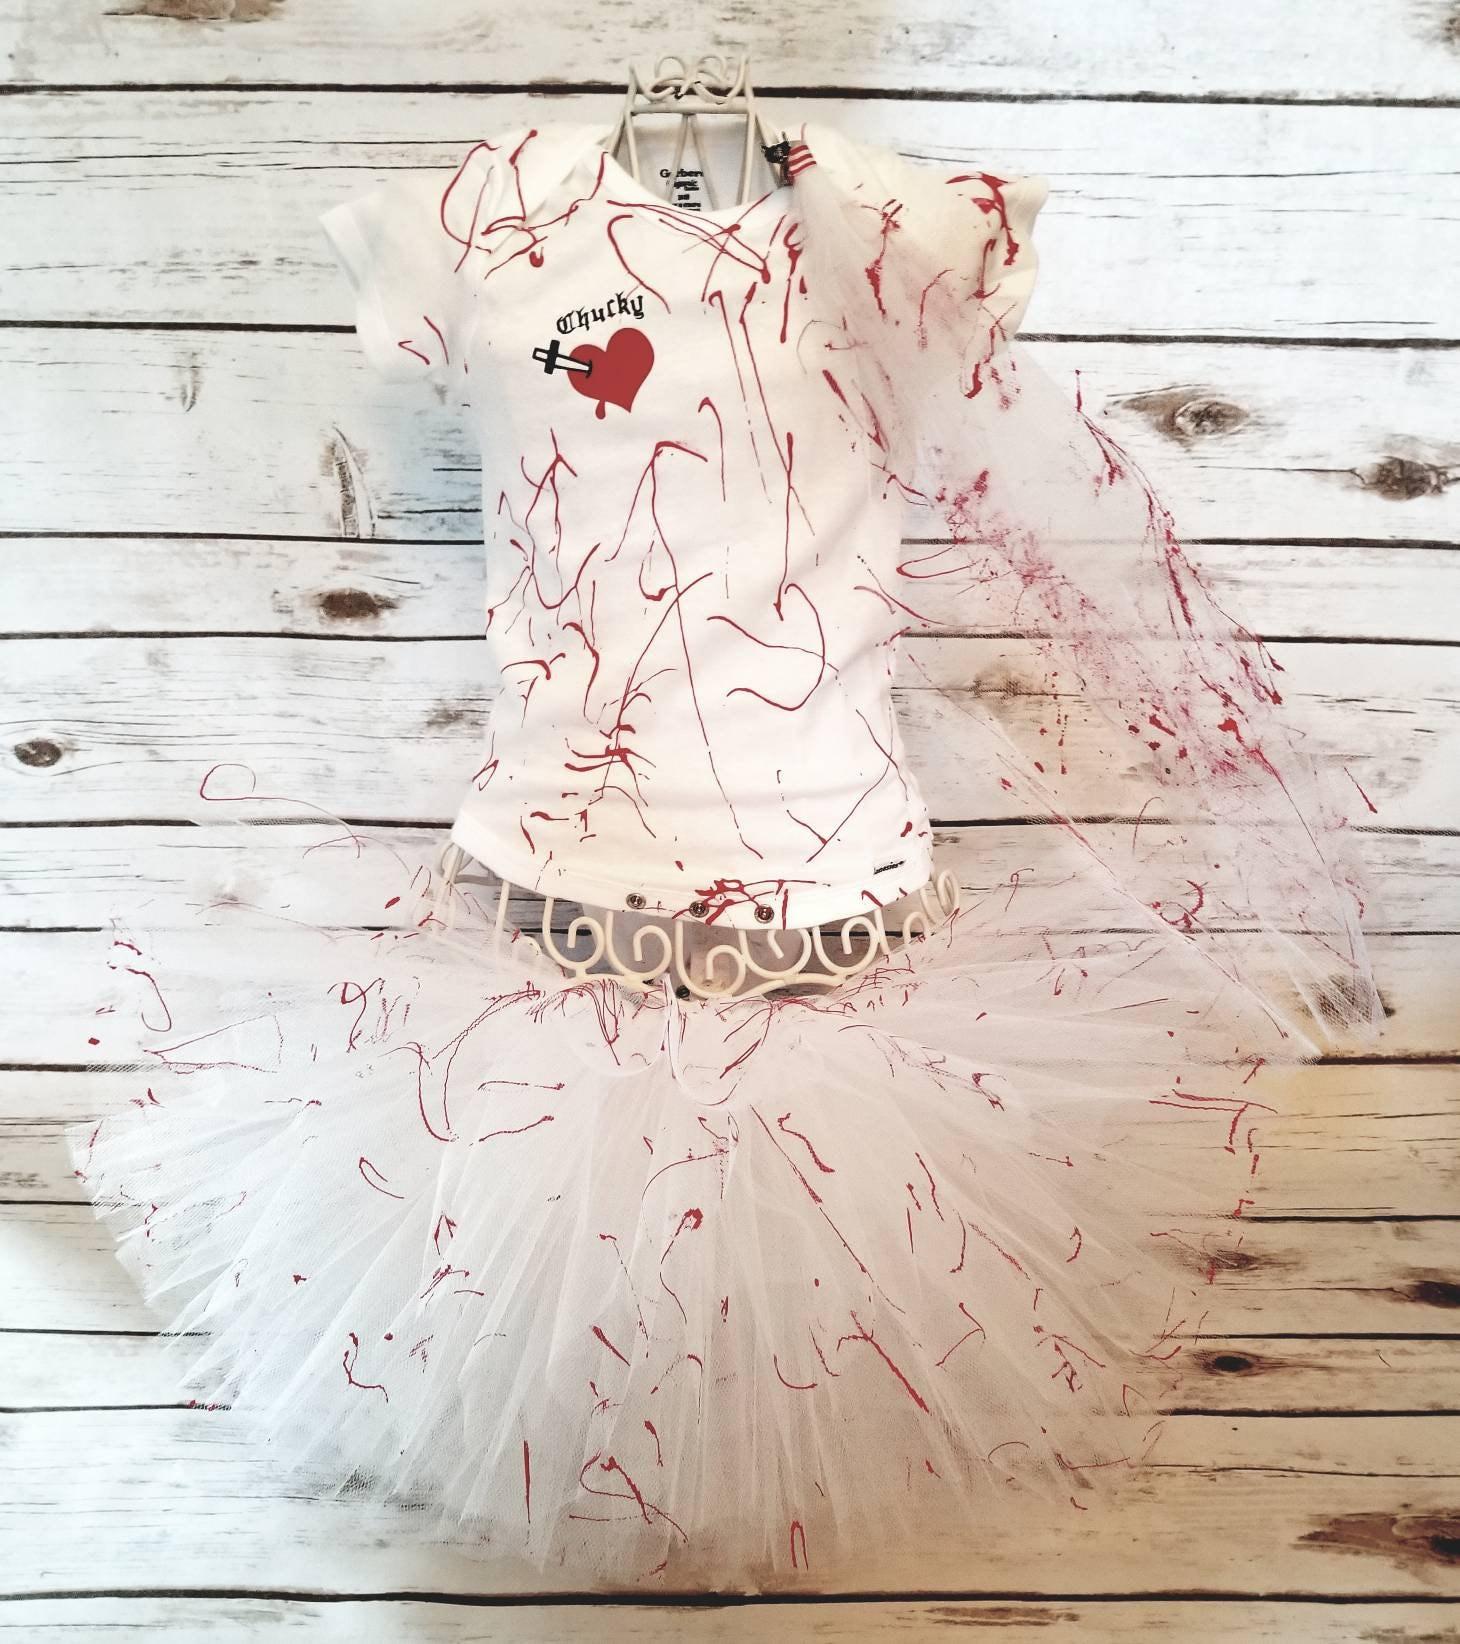 tiffany bride of chucky tutu halloween costume set with veil | etsy